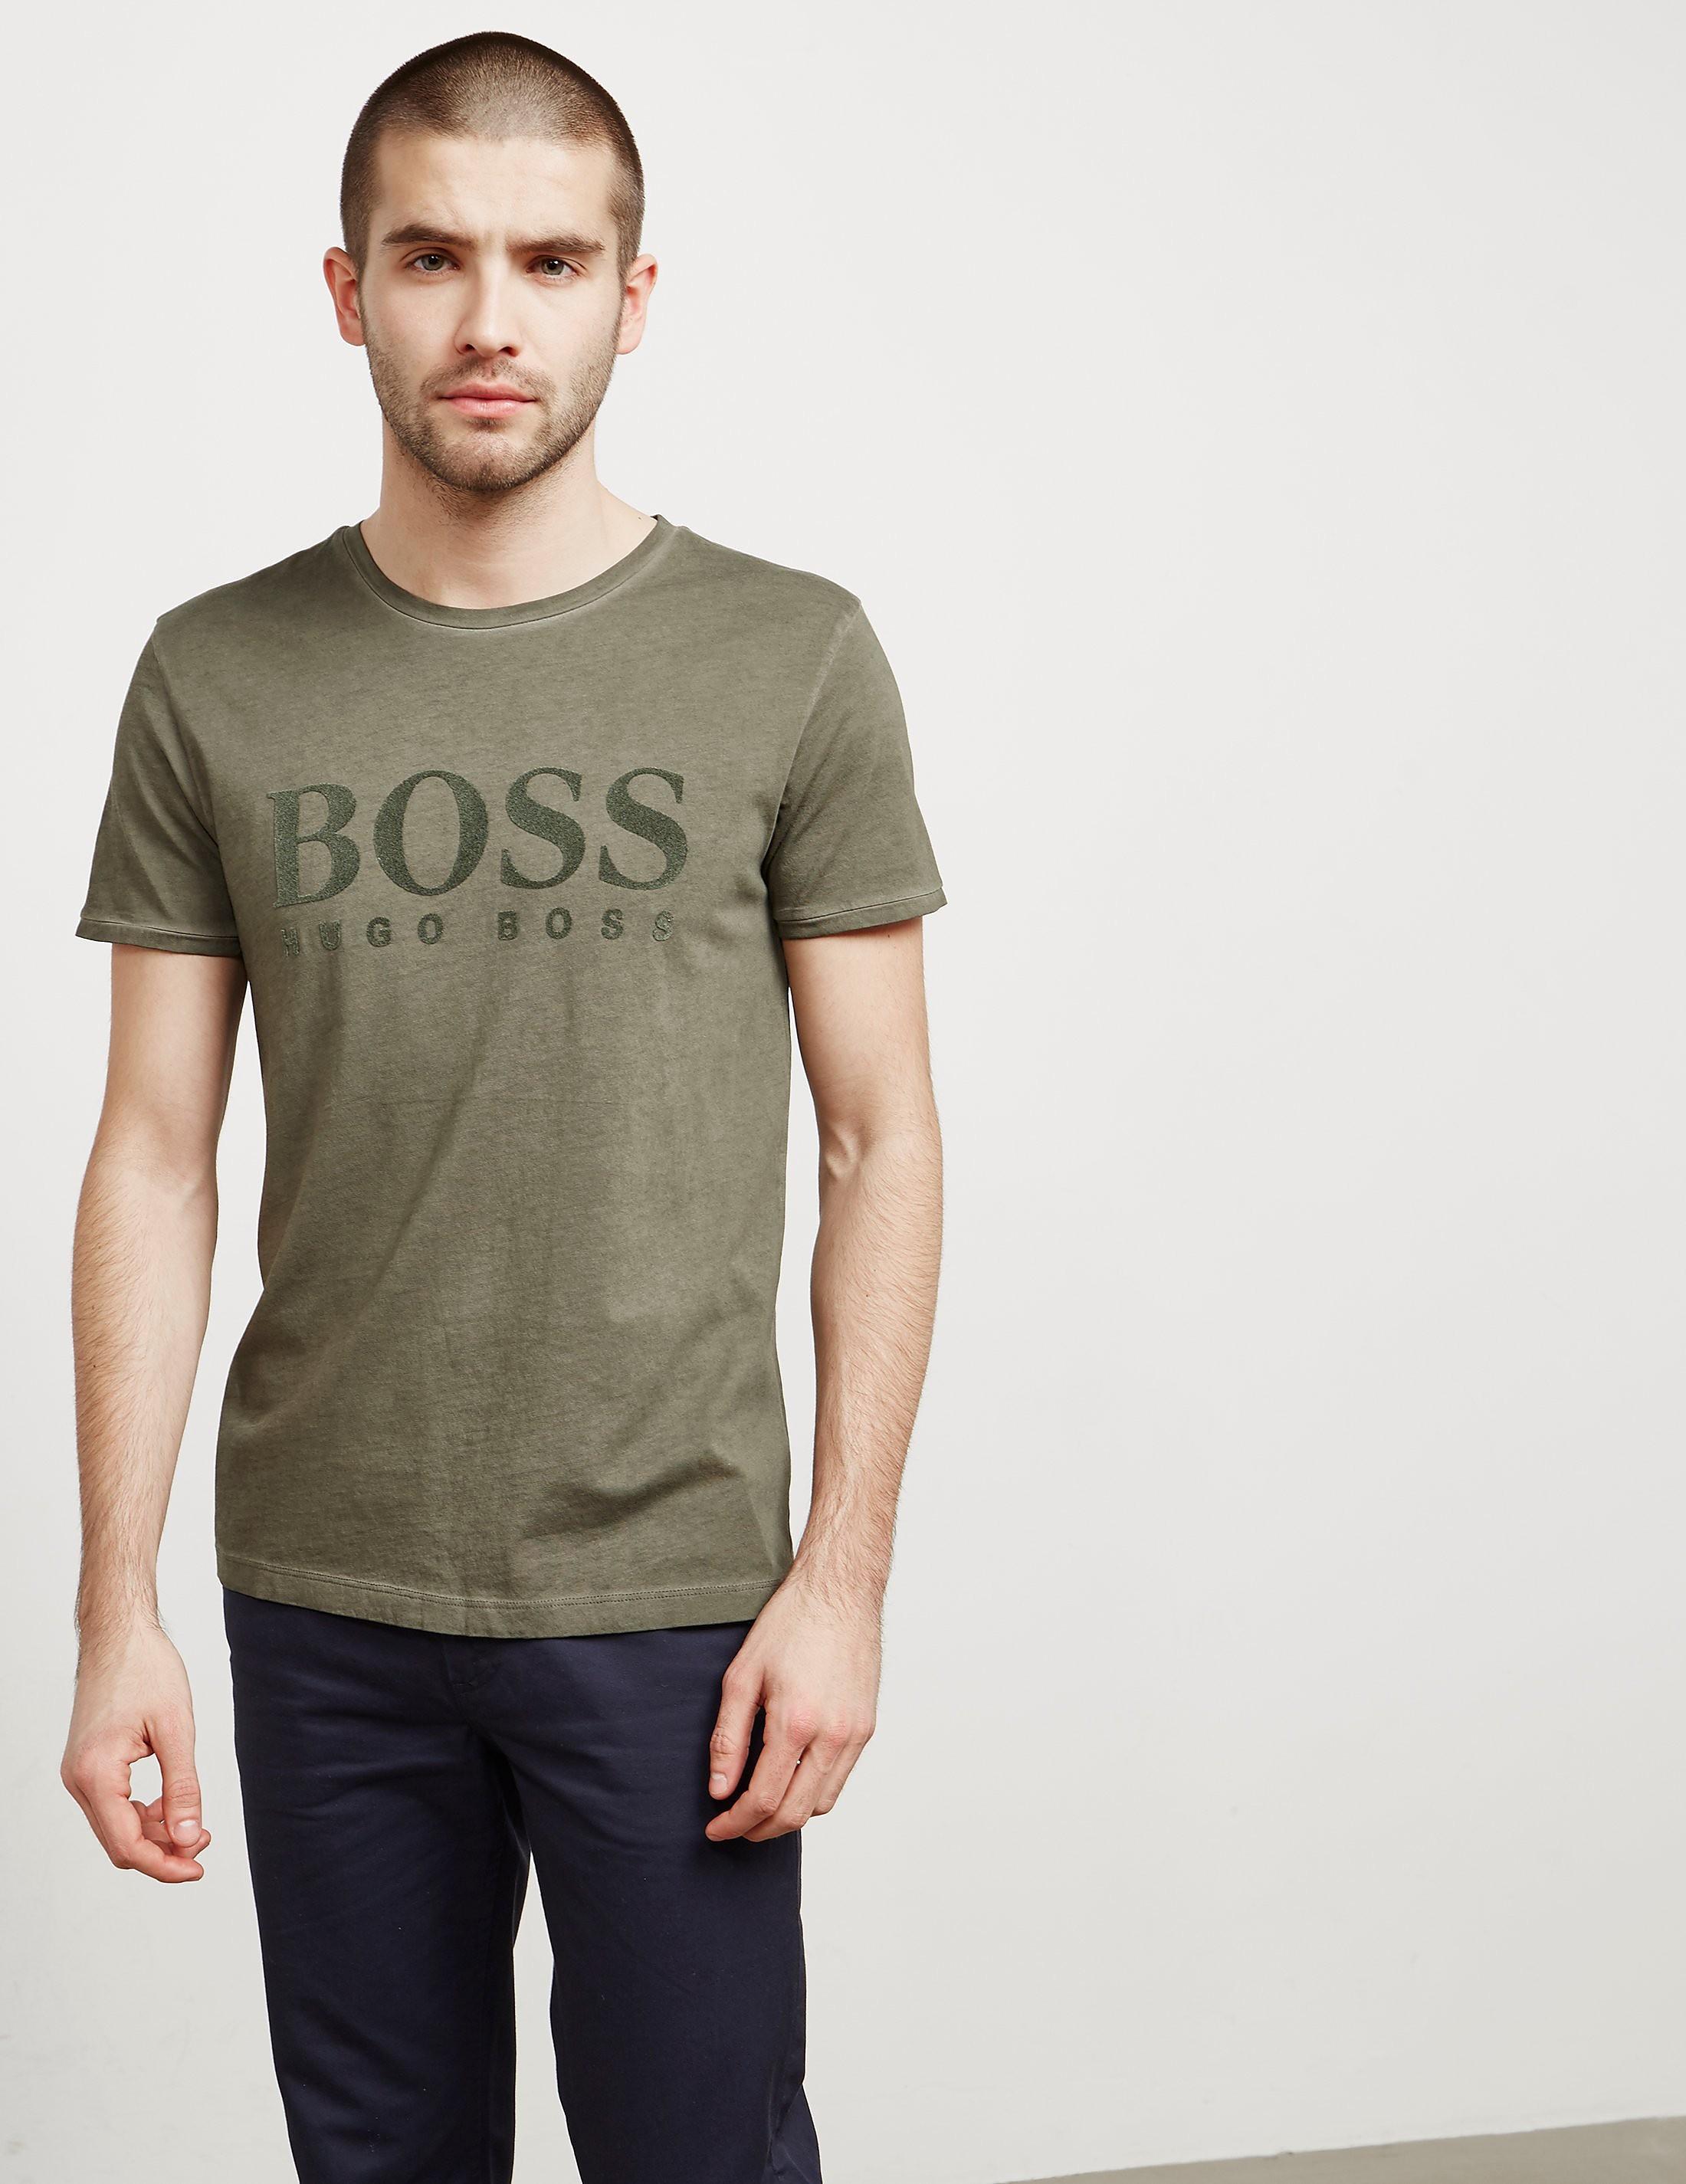 BOSS Orange Tomlouis Flock Short Sleeve T-Shirt